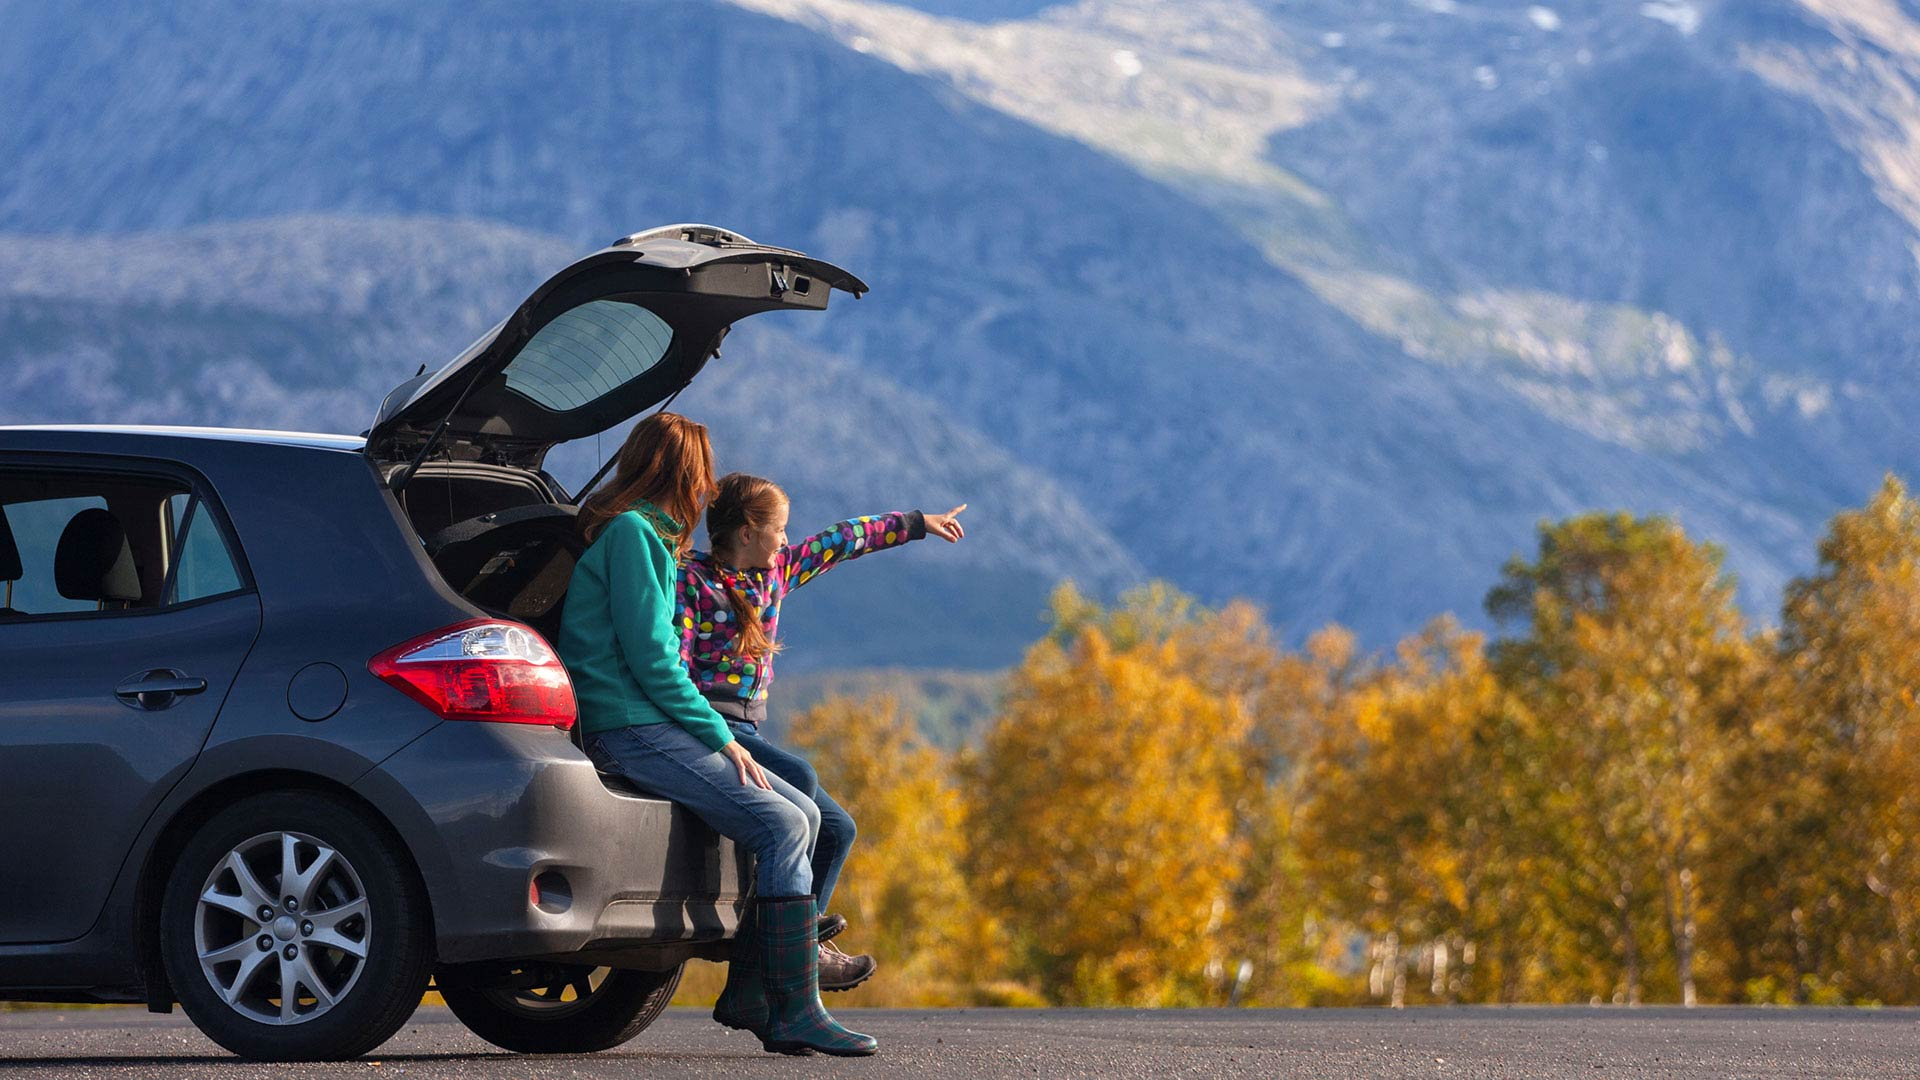 Car Parking Wallpaper Express Norway 7 Days 6 Nights Norway Self Drive Tours